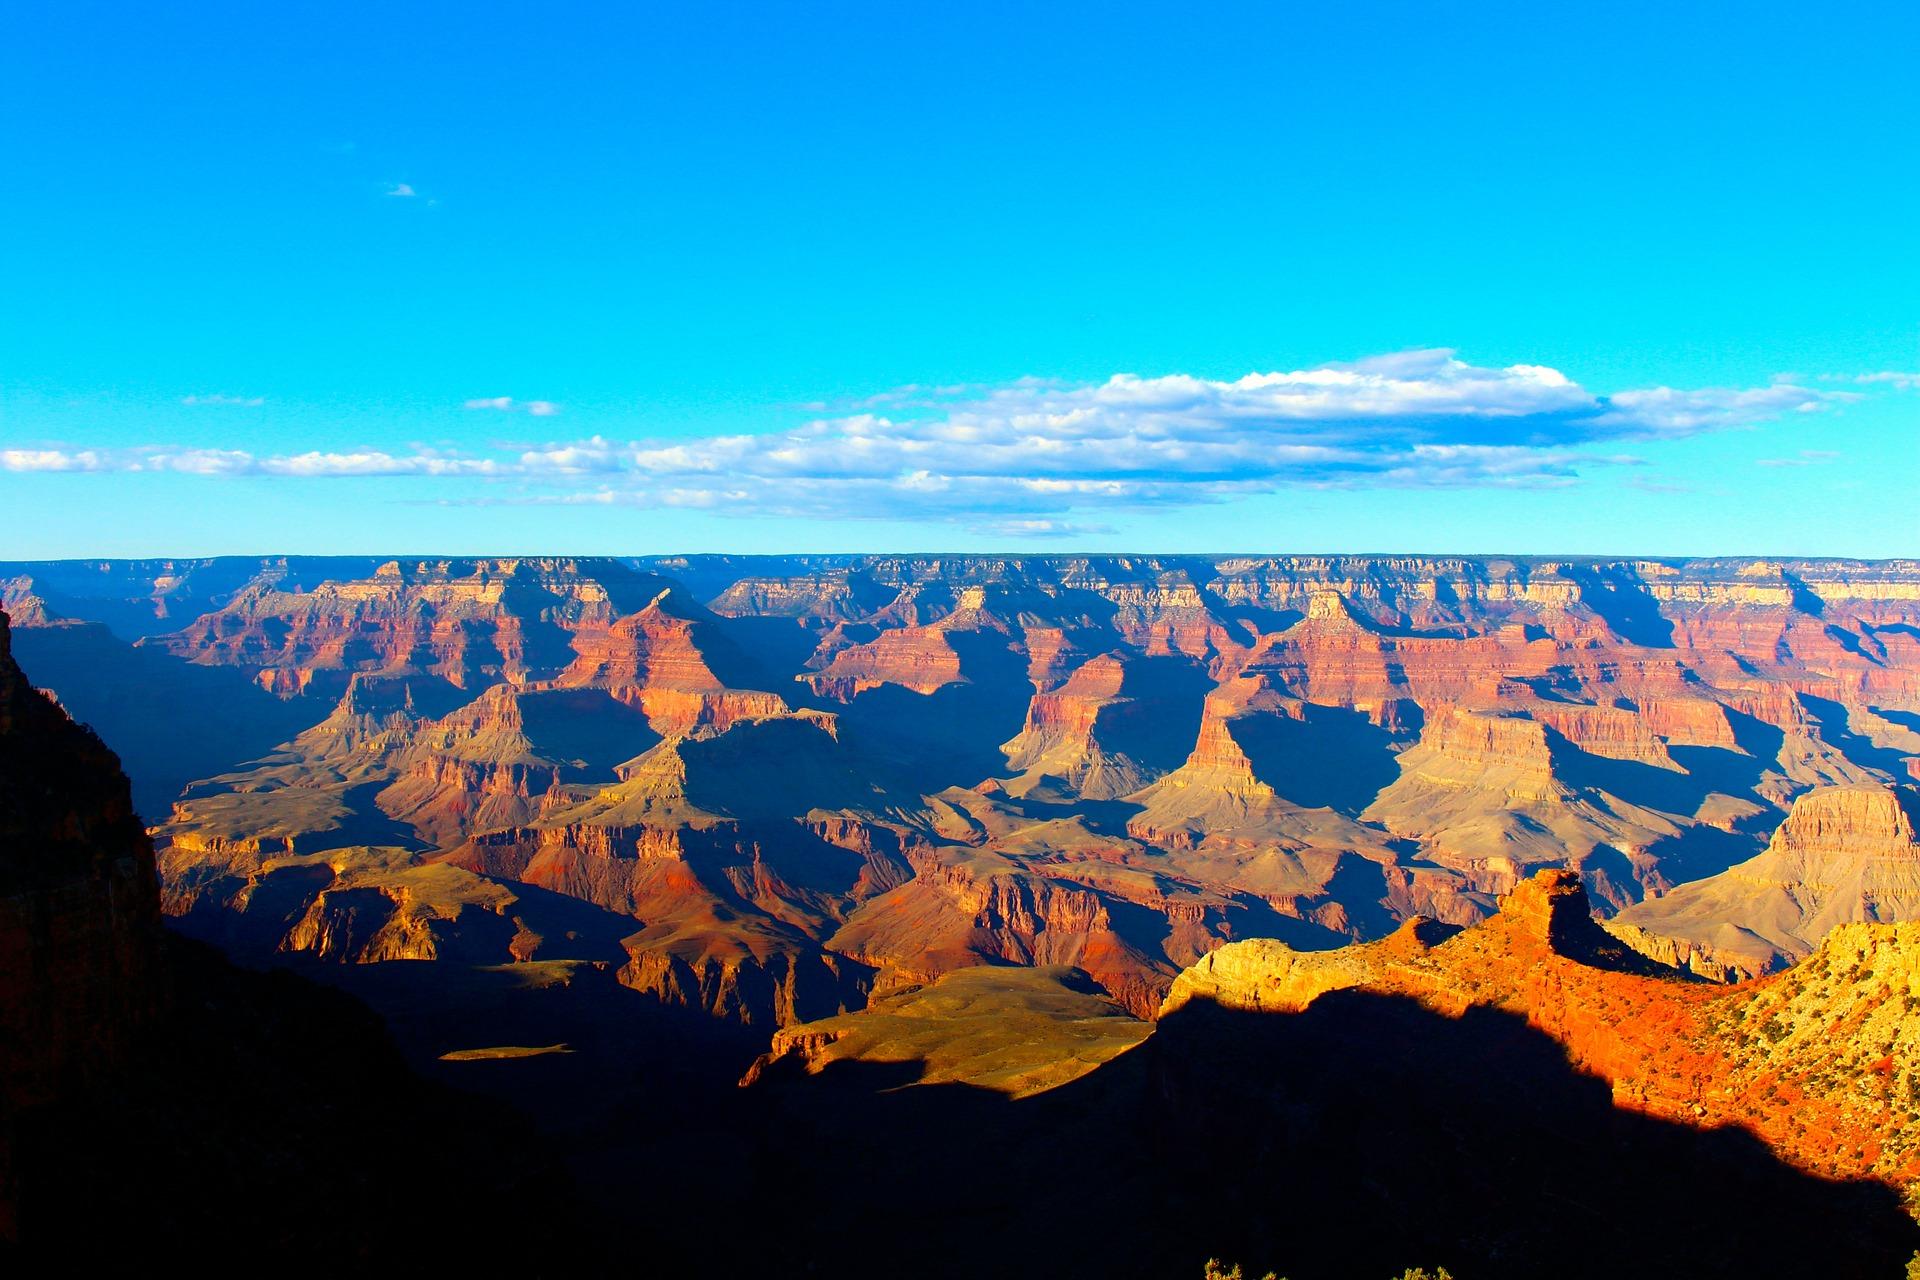 grand-canyon-580804_1920.jpg